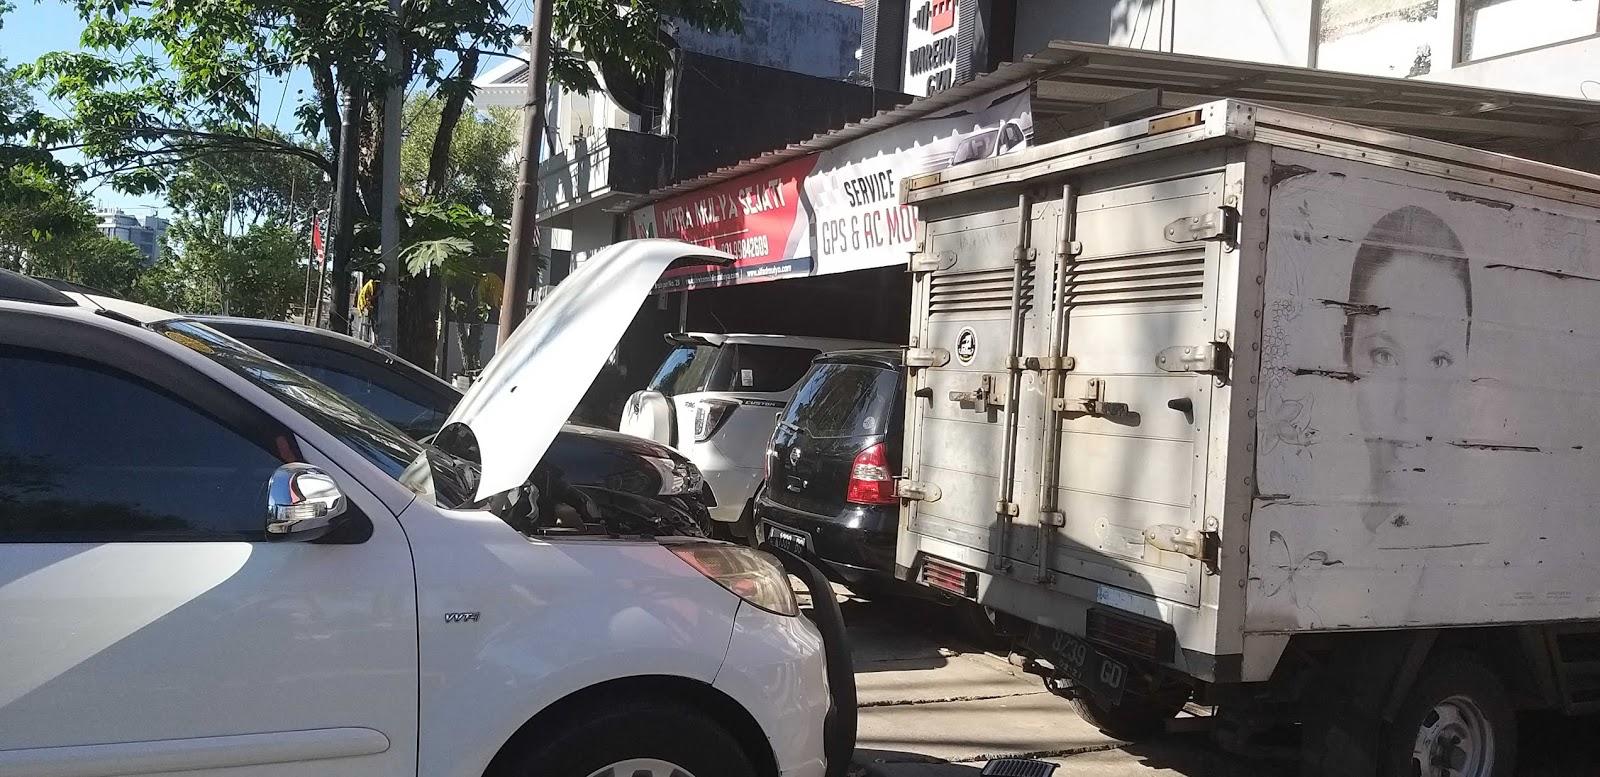 Service Mobil Panggilan Surabaya Solusi Mobil Mogok Malam Hari Bengkel Mobil Dan Servis Mobil Panggilan Surabaya 08113465899